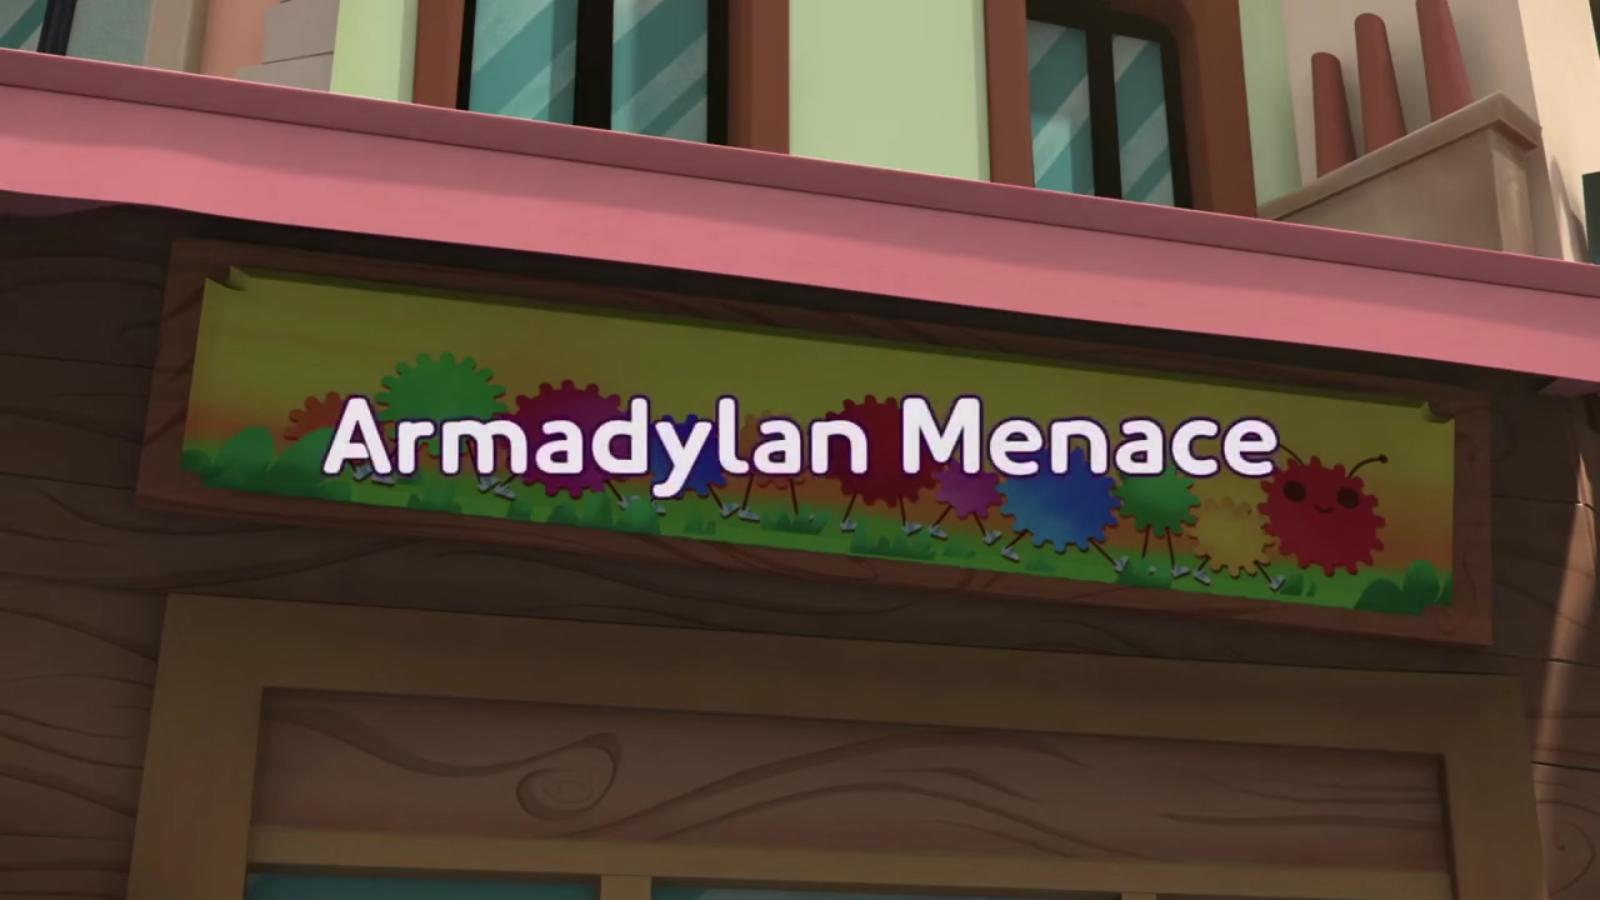 Armadylan Menace